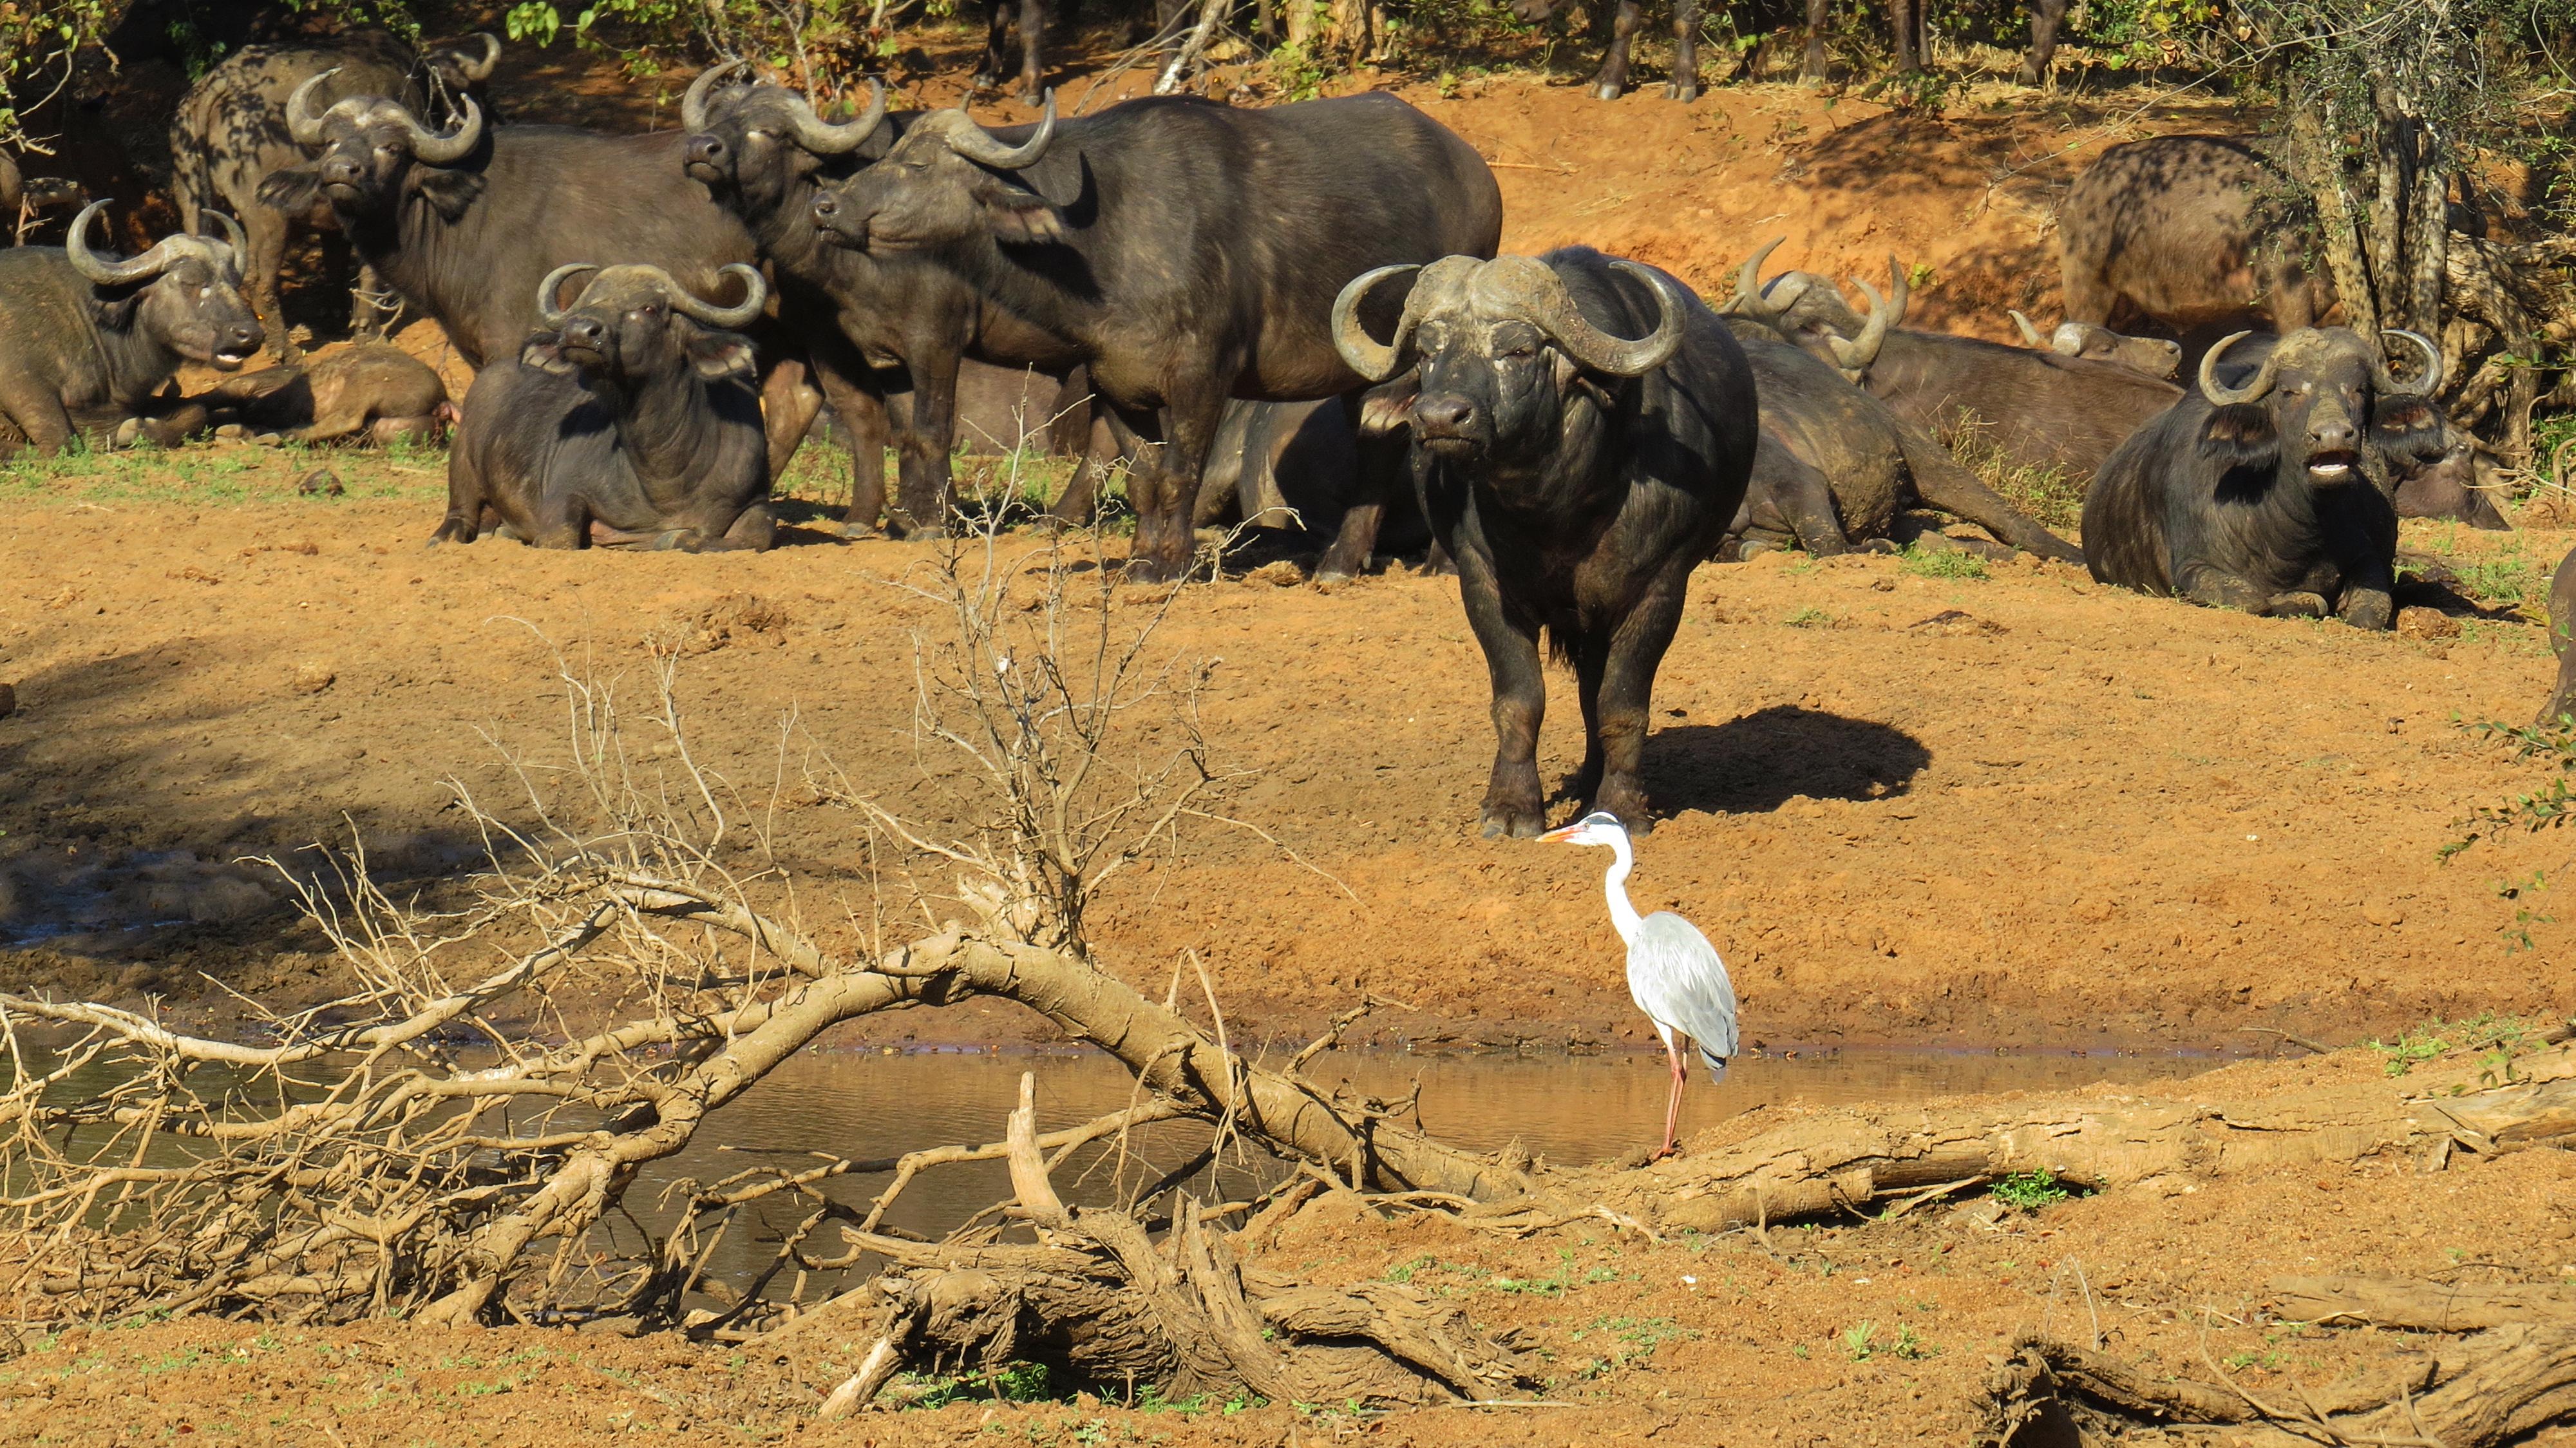 birding in kruger national park 171 birding and wildlife safaris